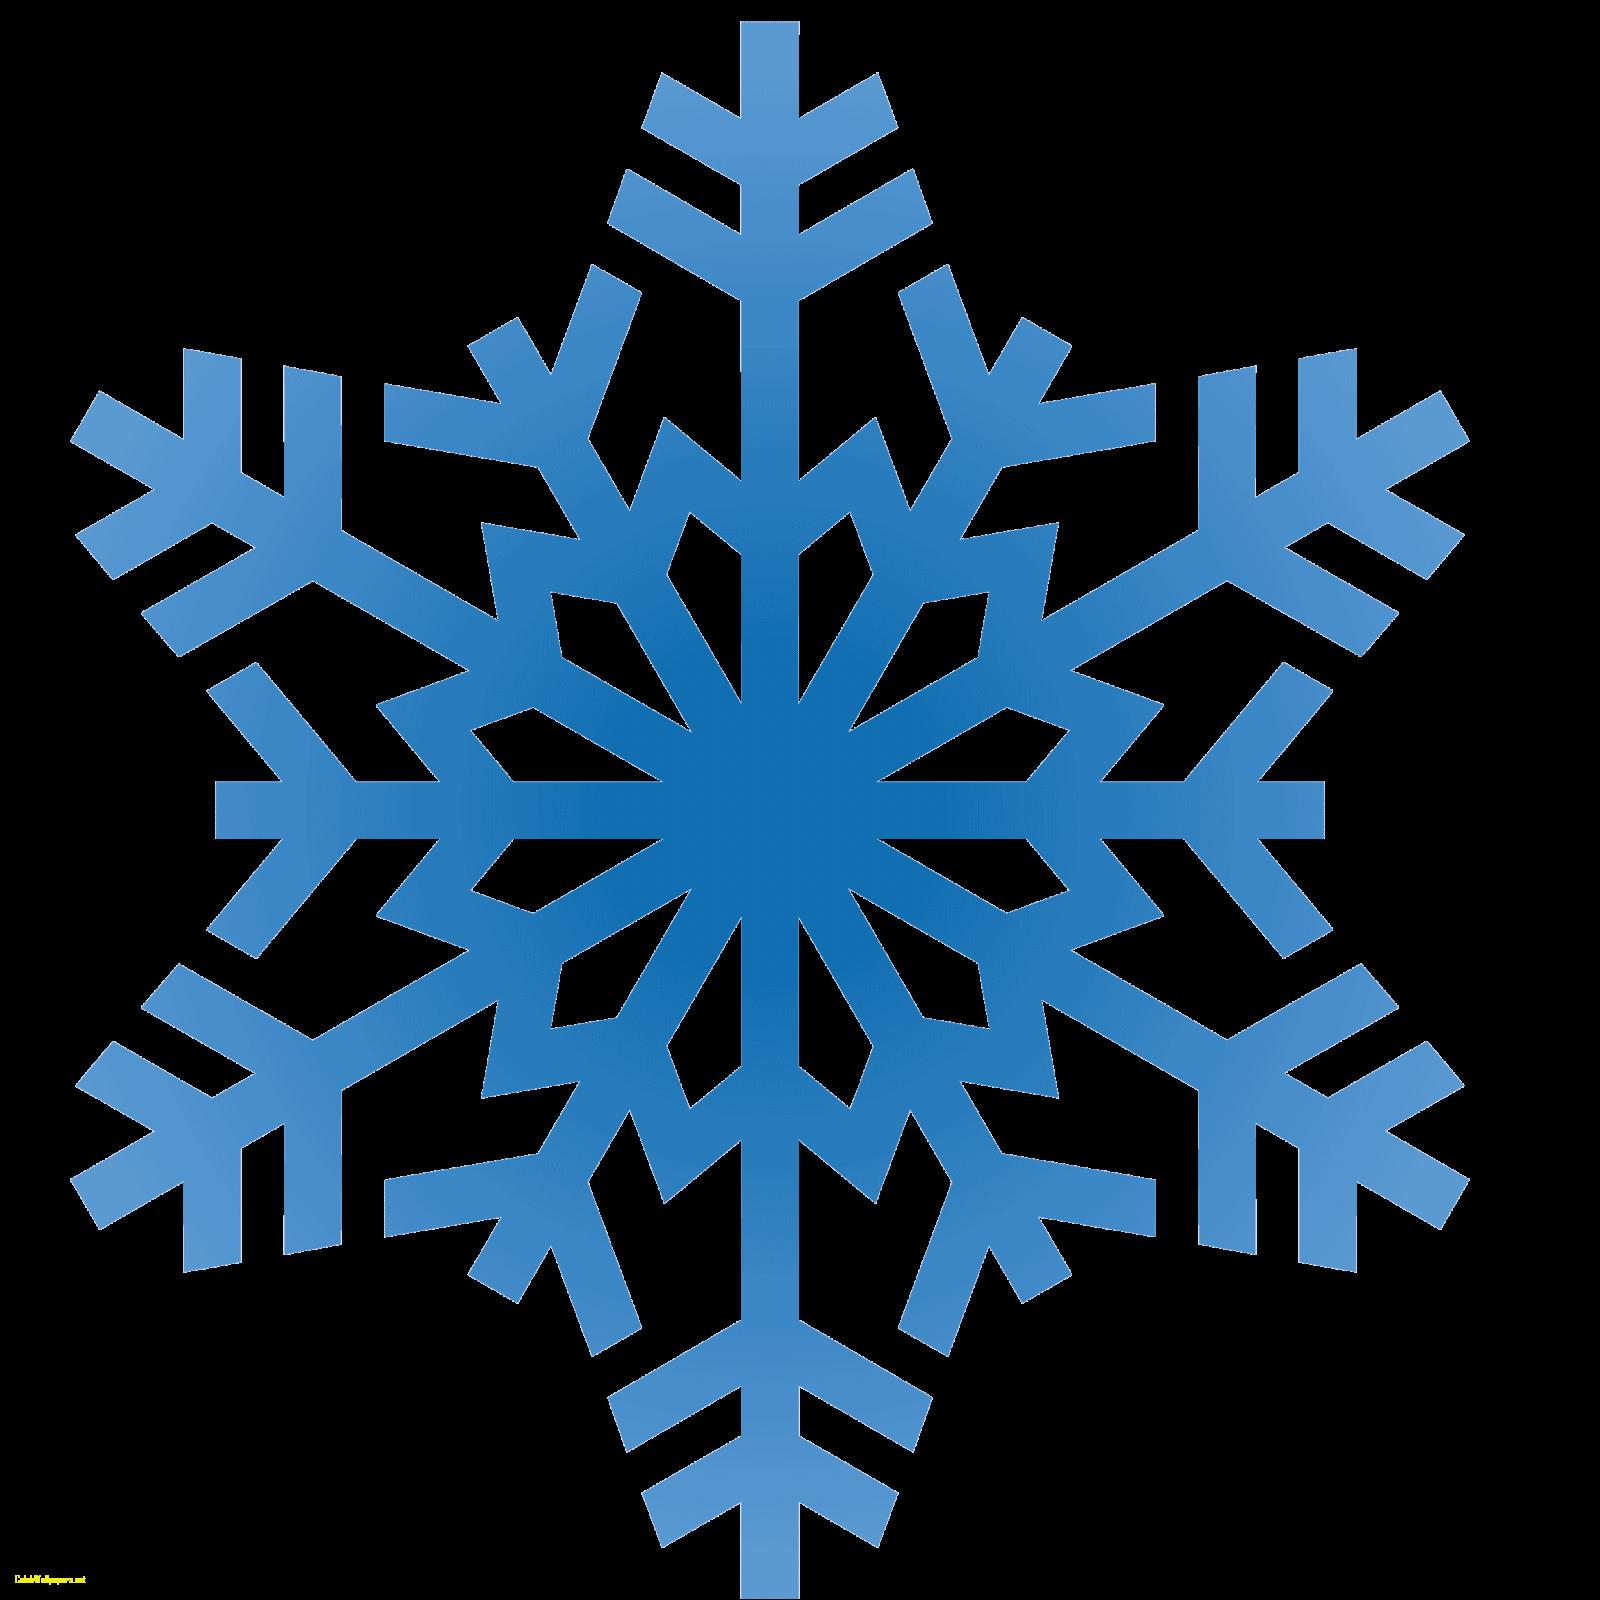 Clipart snowflake city. Snowflakes transparent background free